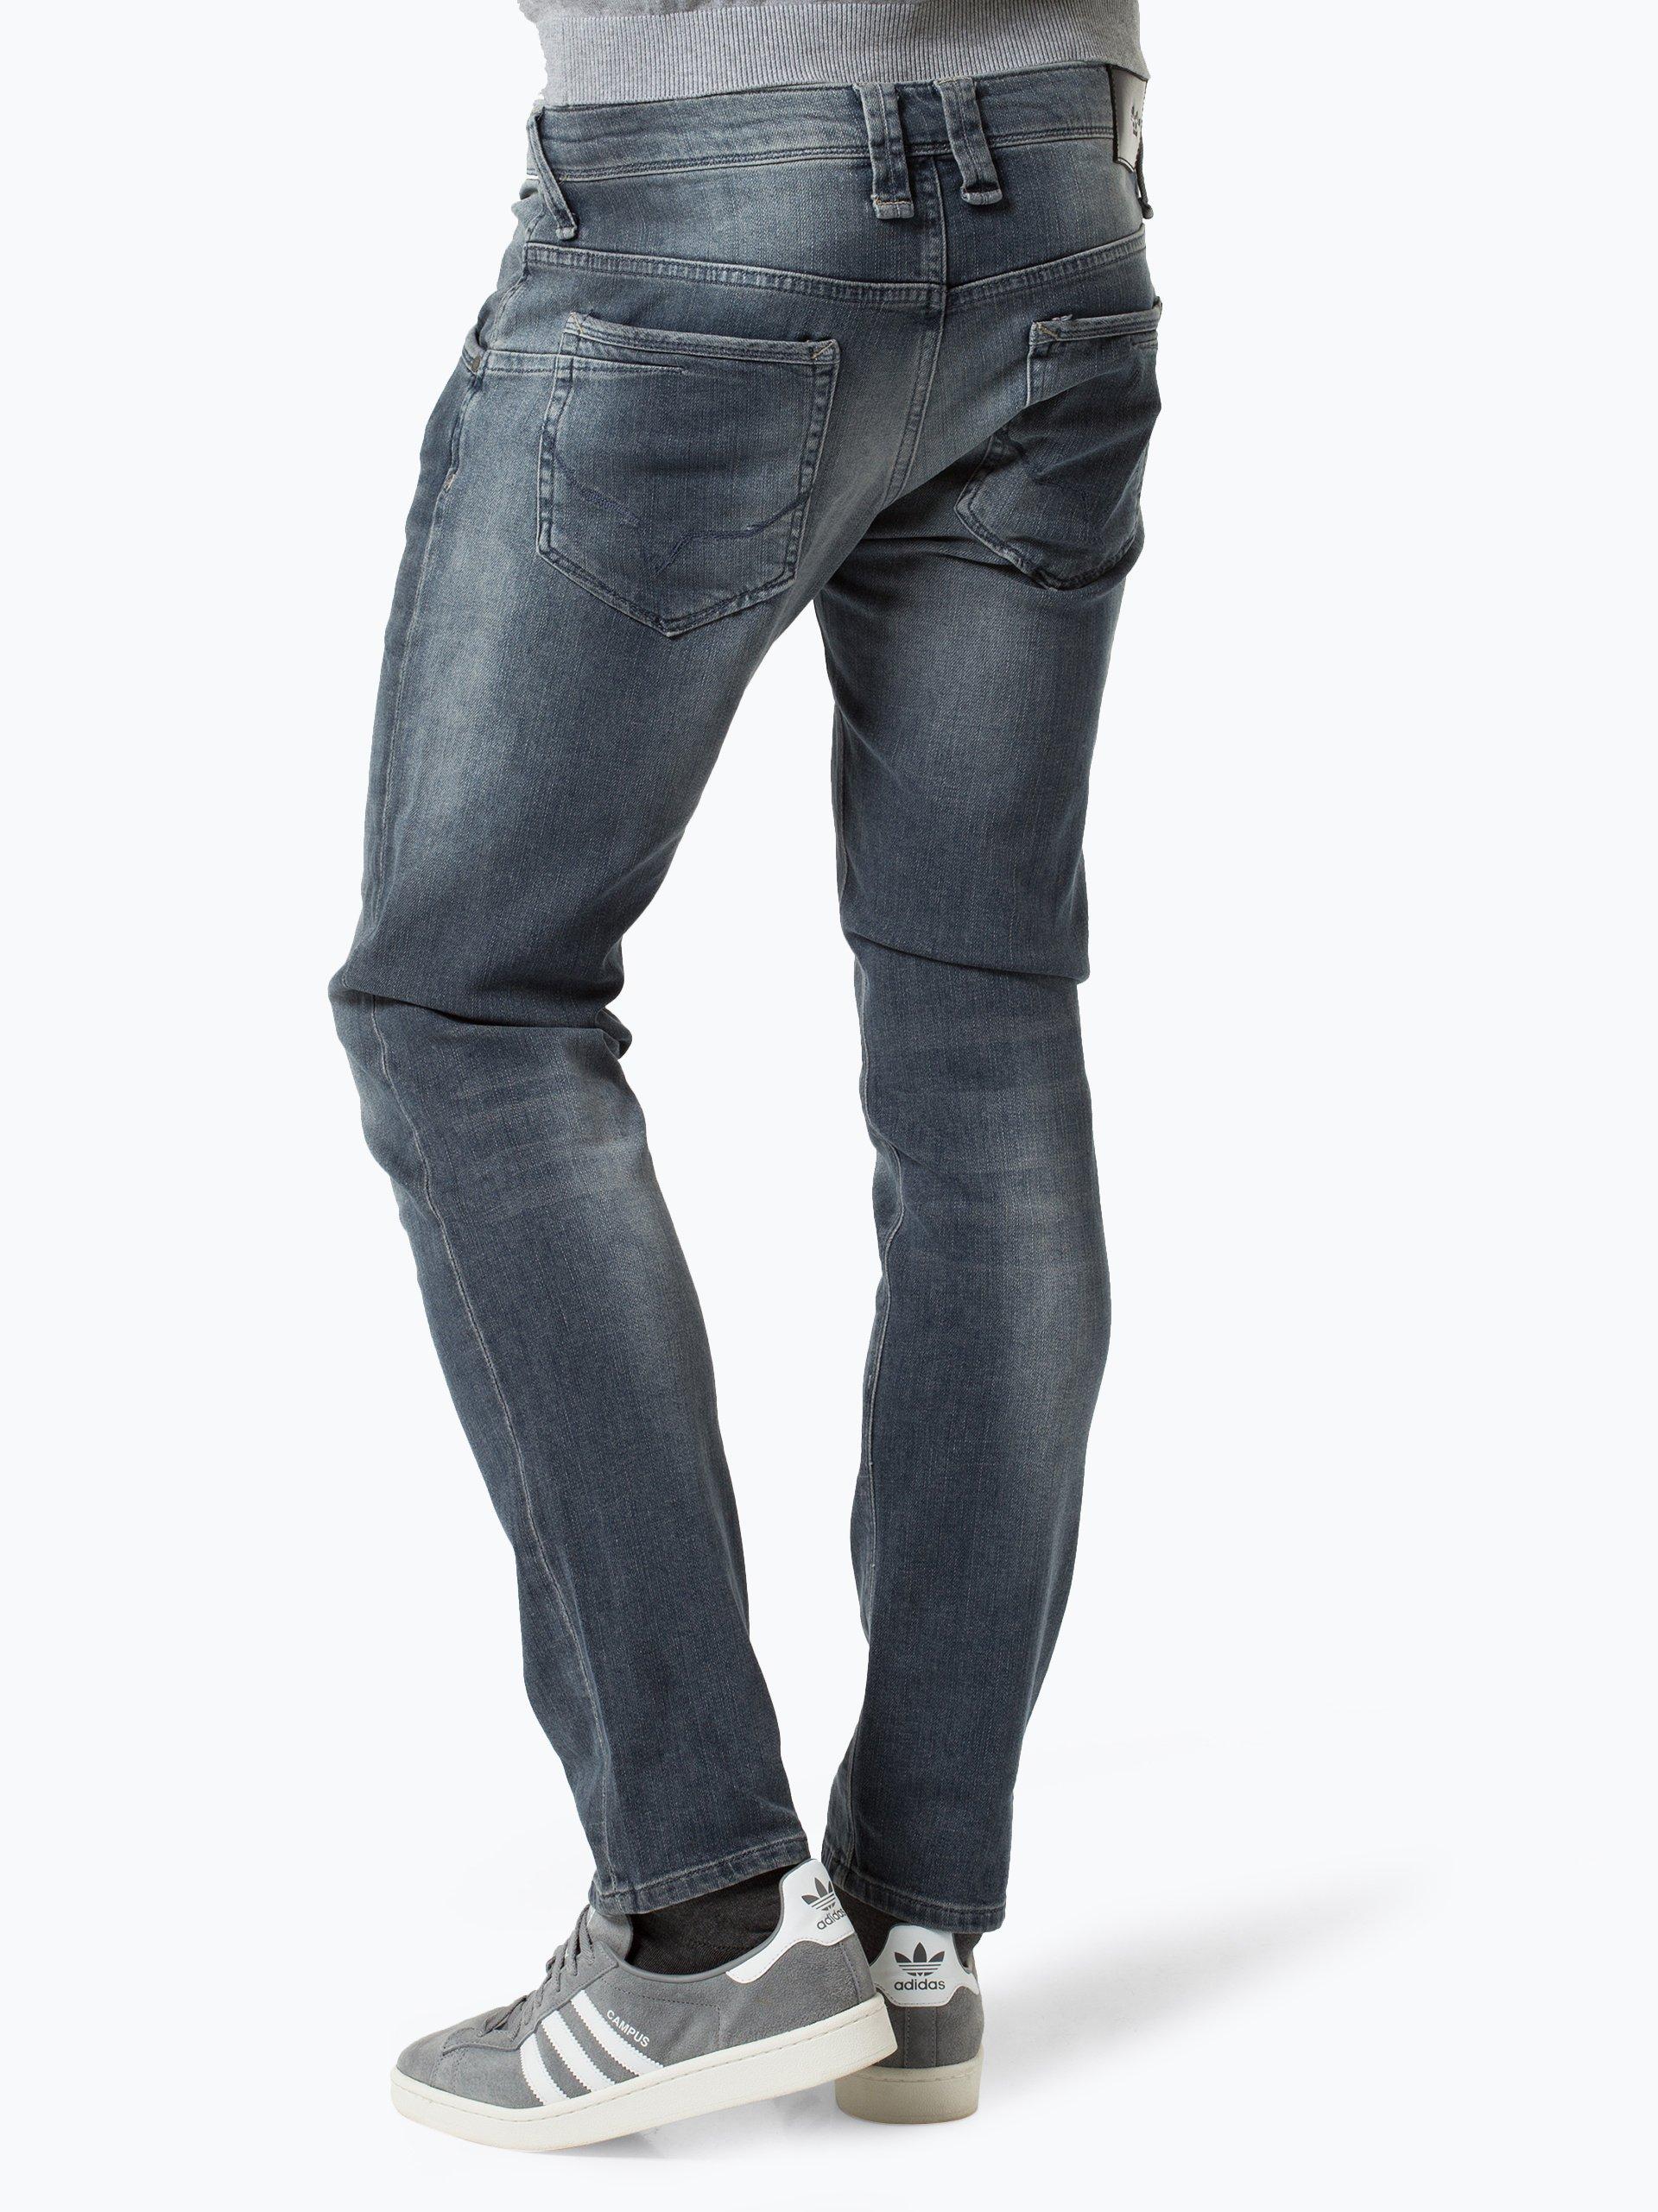 pepe jeans herren jeans zinc medium stone light stone uni online kaufen vangraaf com. Black Bedroom Furniture Sets. Home Design Ideas